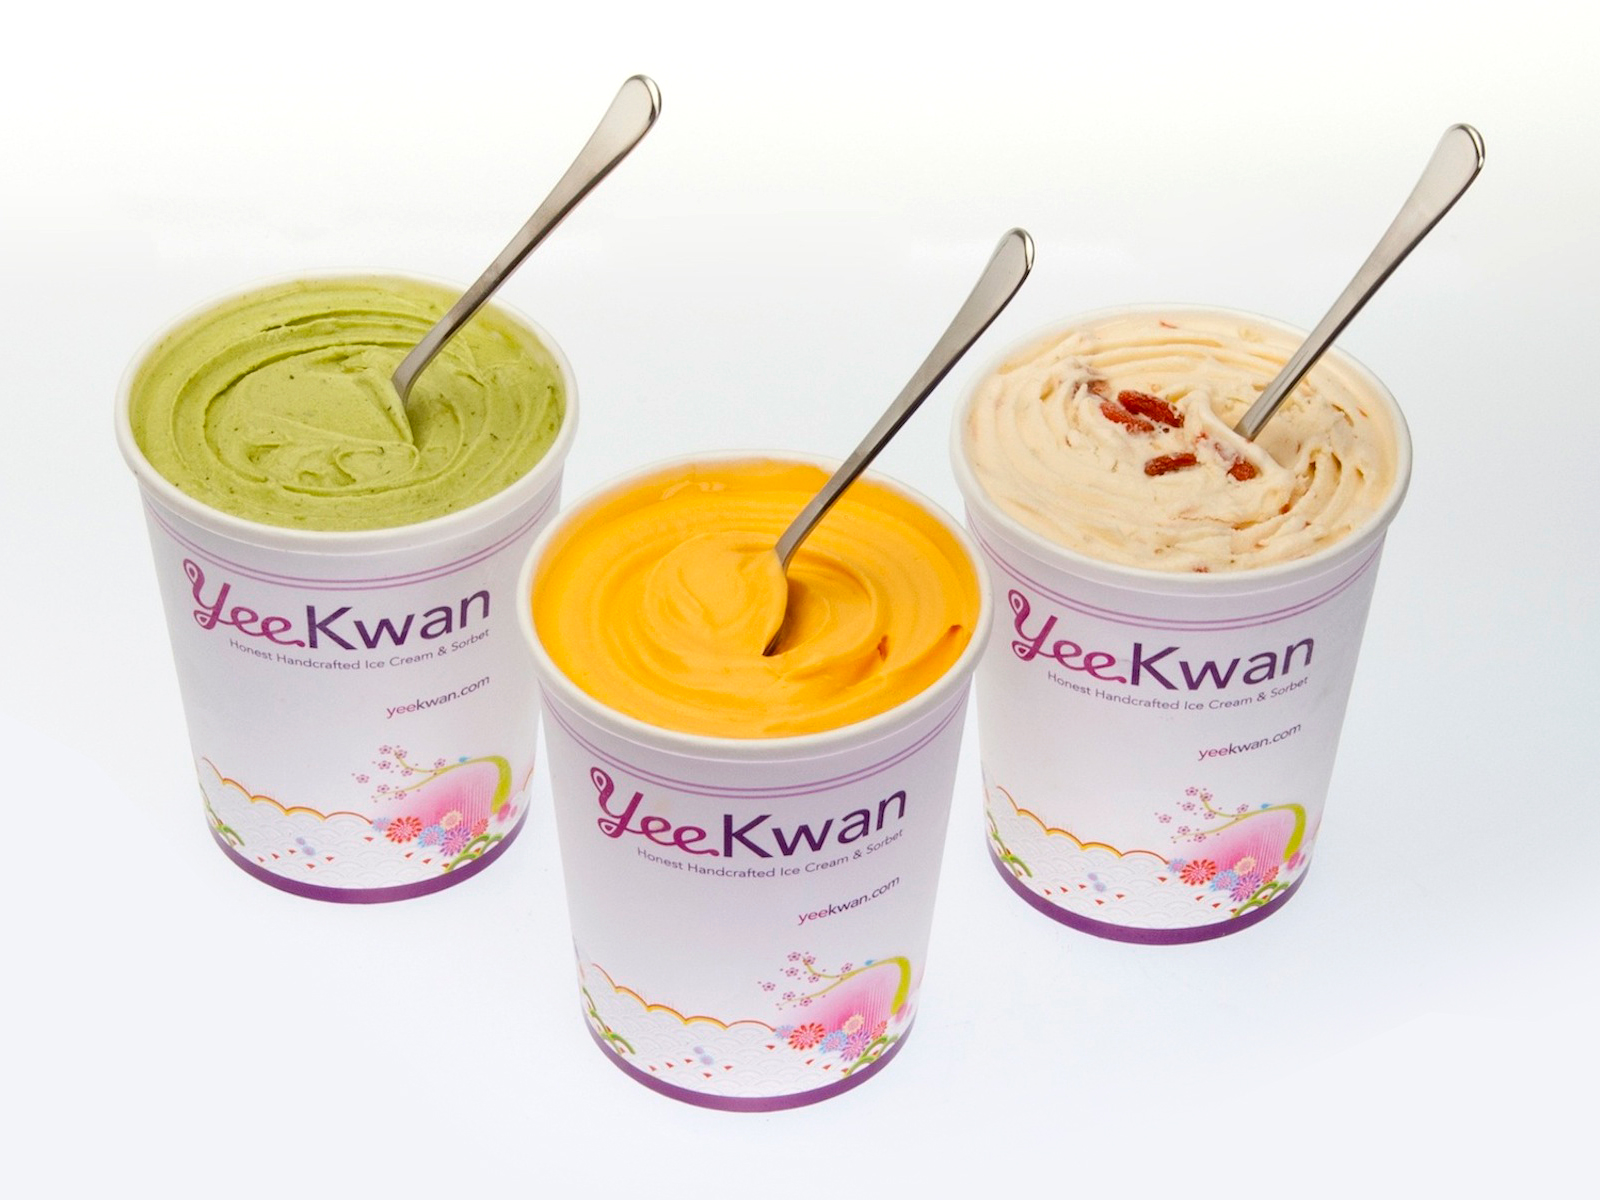 cindy-YeeKwan_ice-cream-3-LR